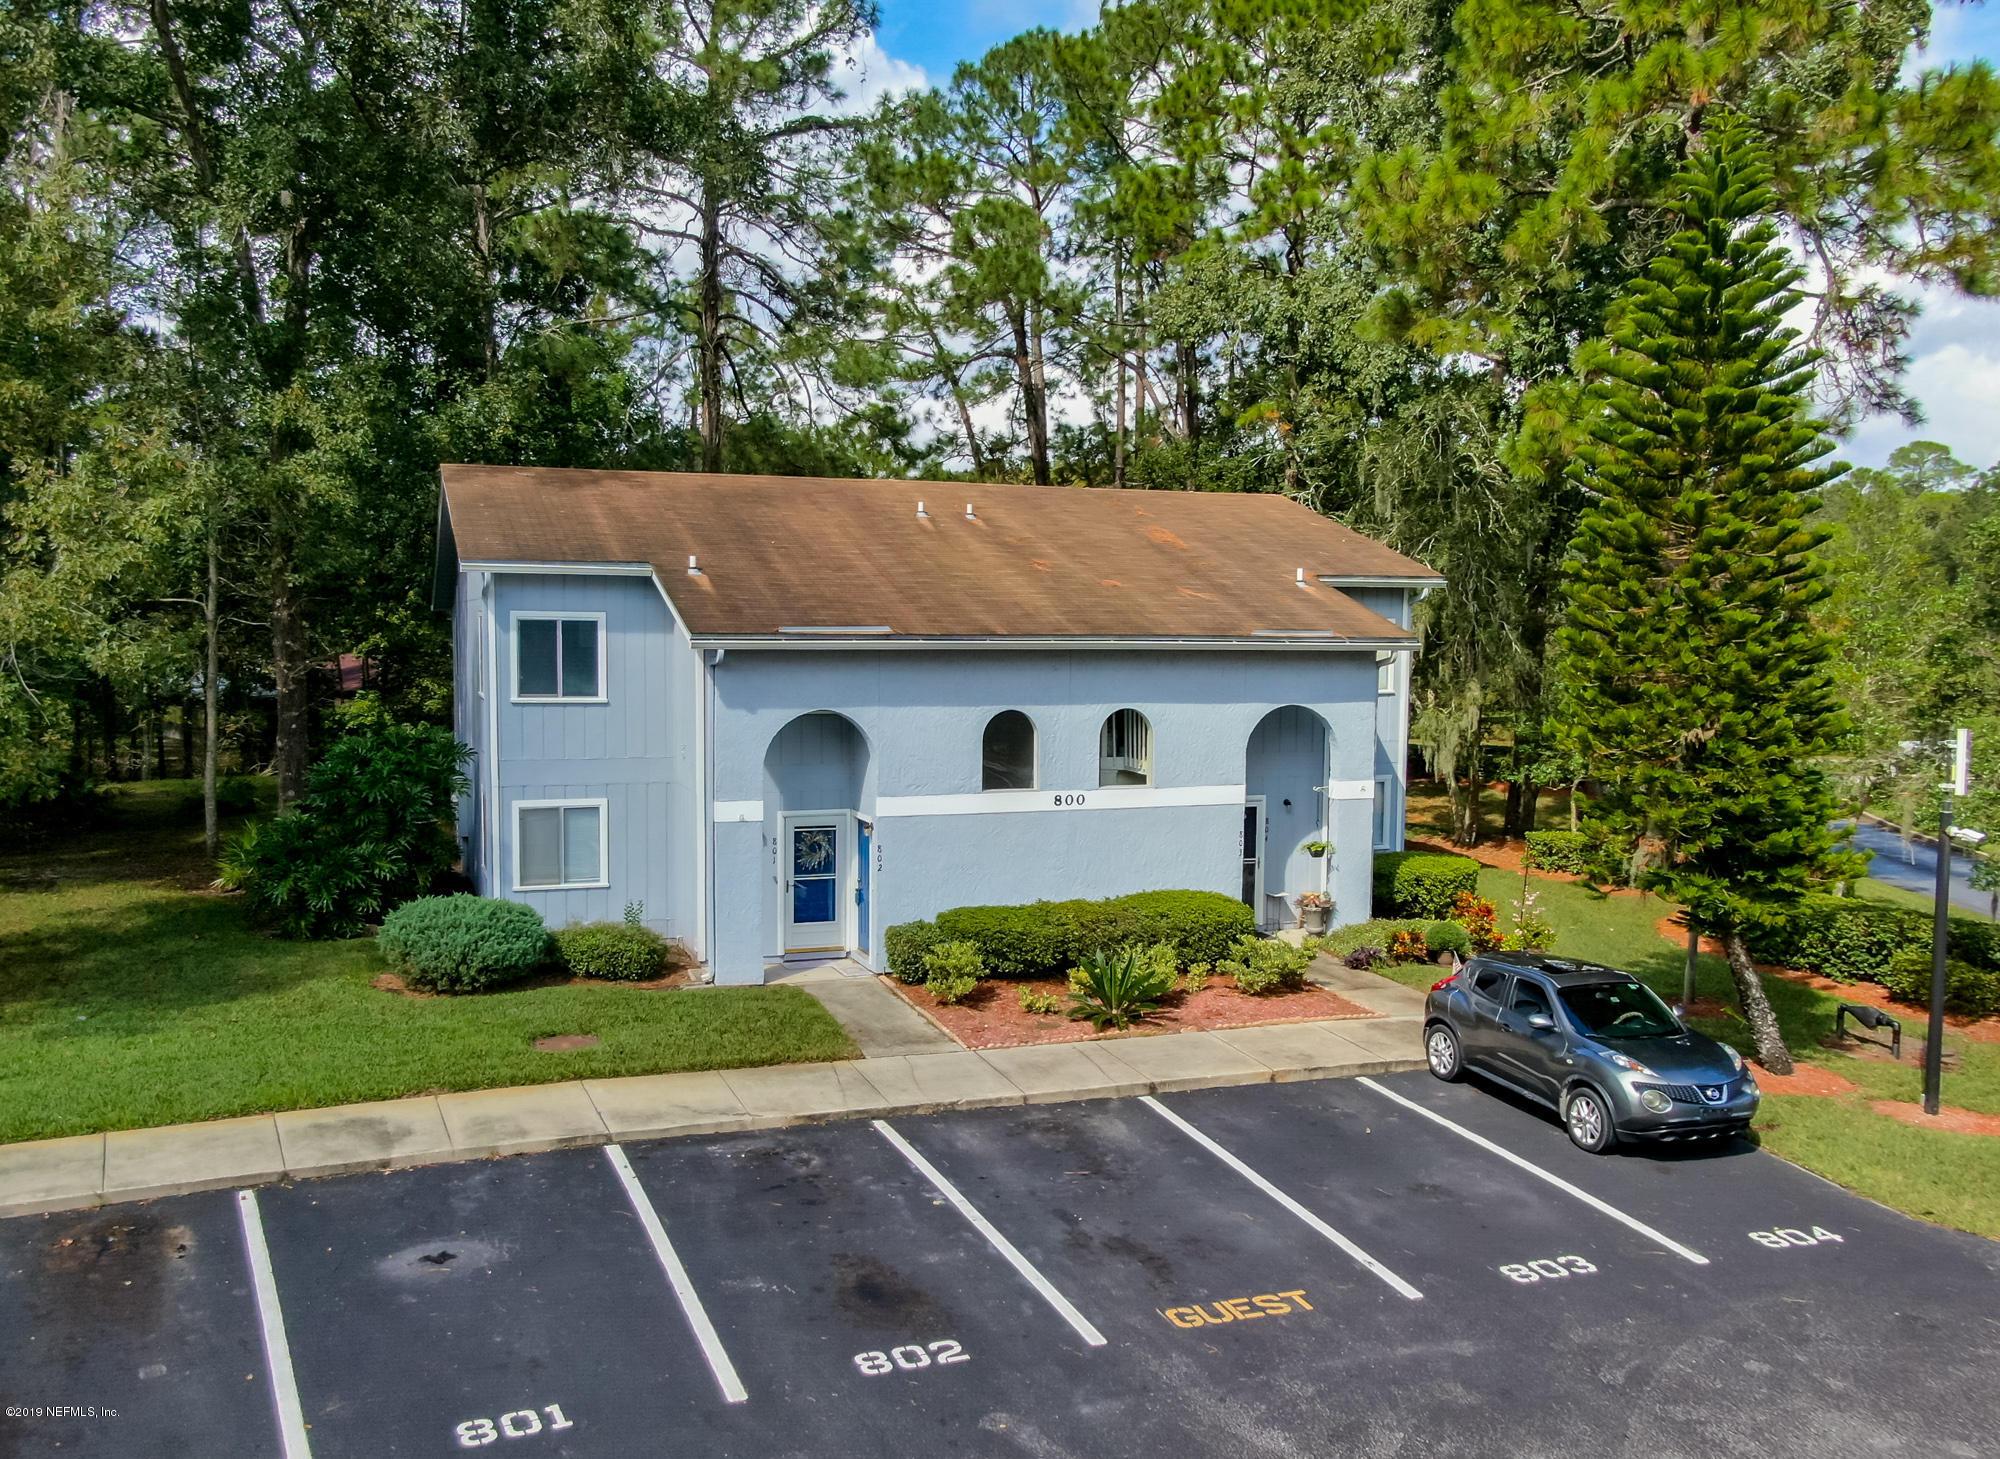 3270 RICKY- JACKSONVILLE- FLORIDA 32223, 2 Bedrooms Bedrooms, ,2 BathroomsBathrooms,Condo,For sale,RICKY,1022132